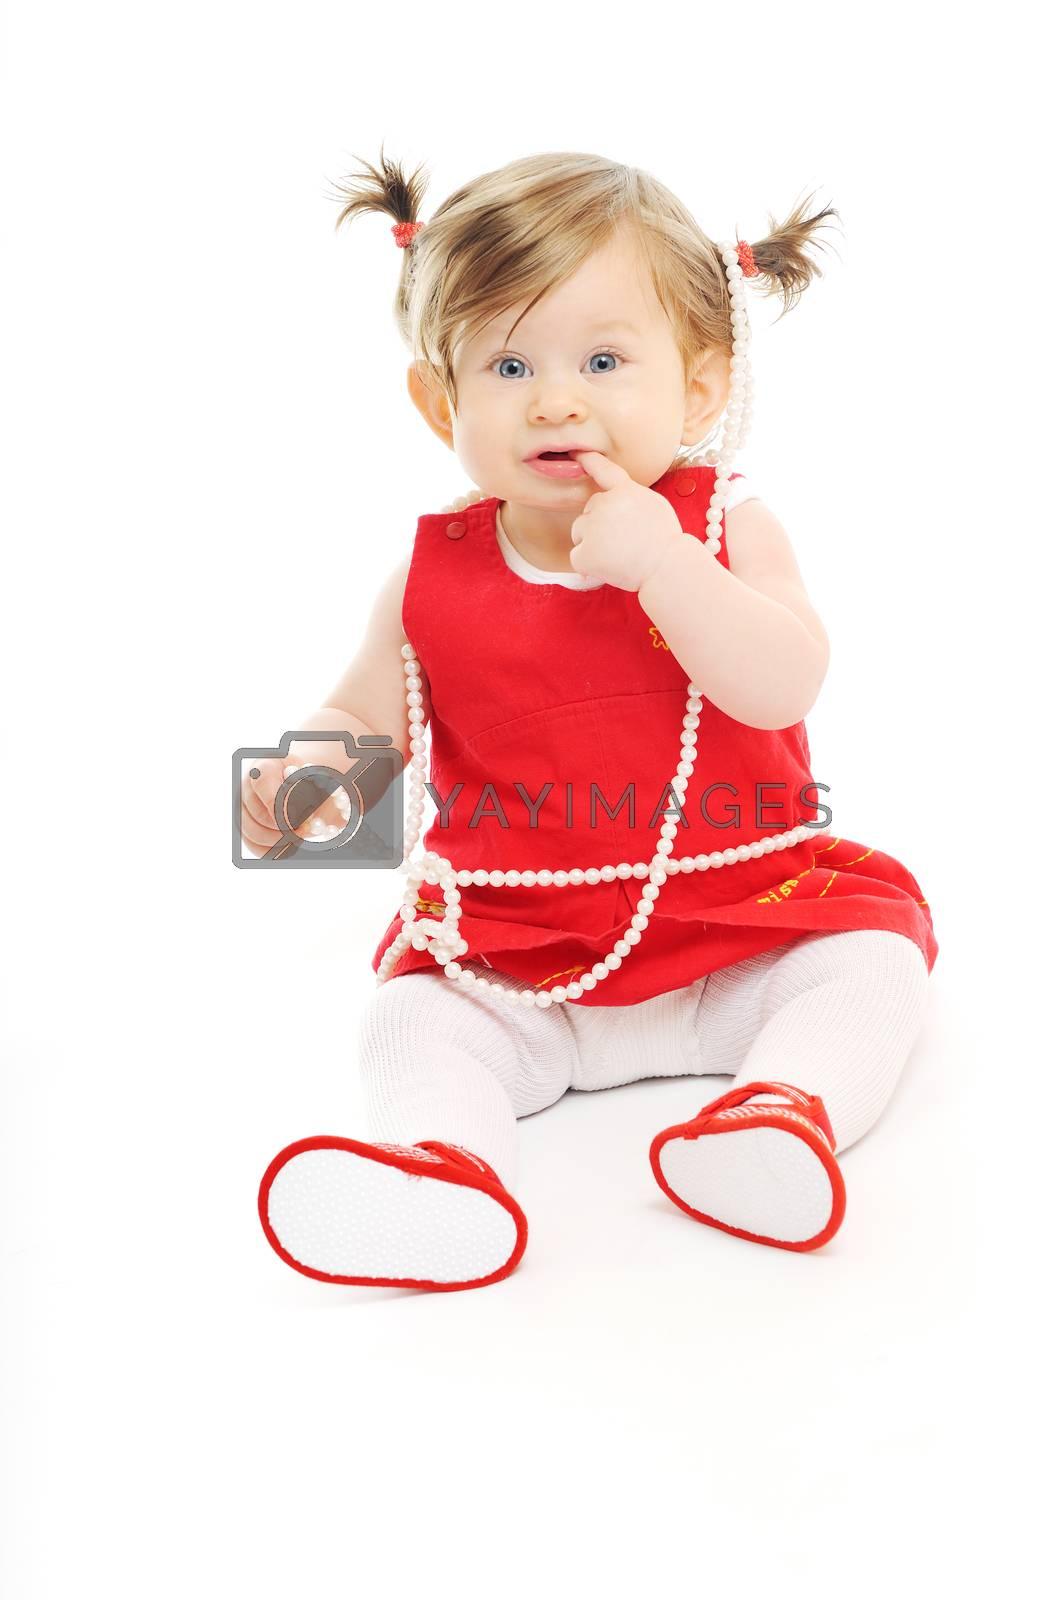 one happy  baby child isolated on white background